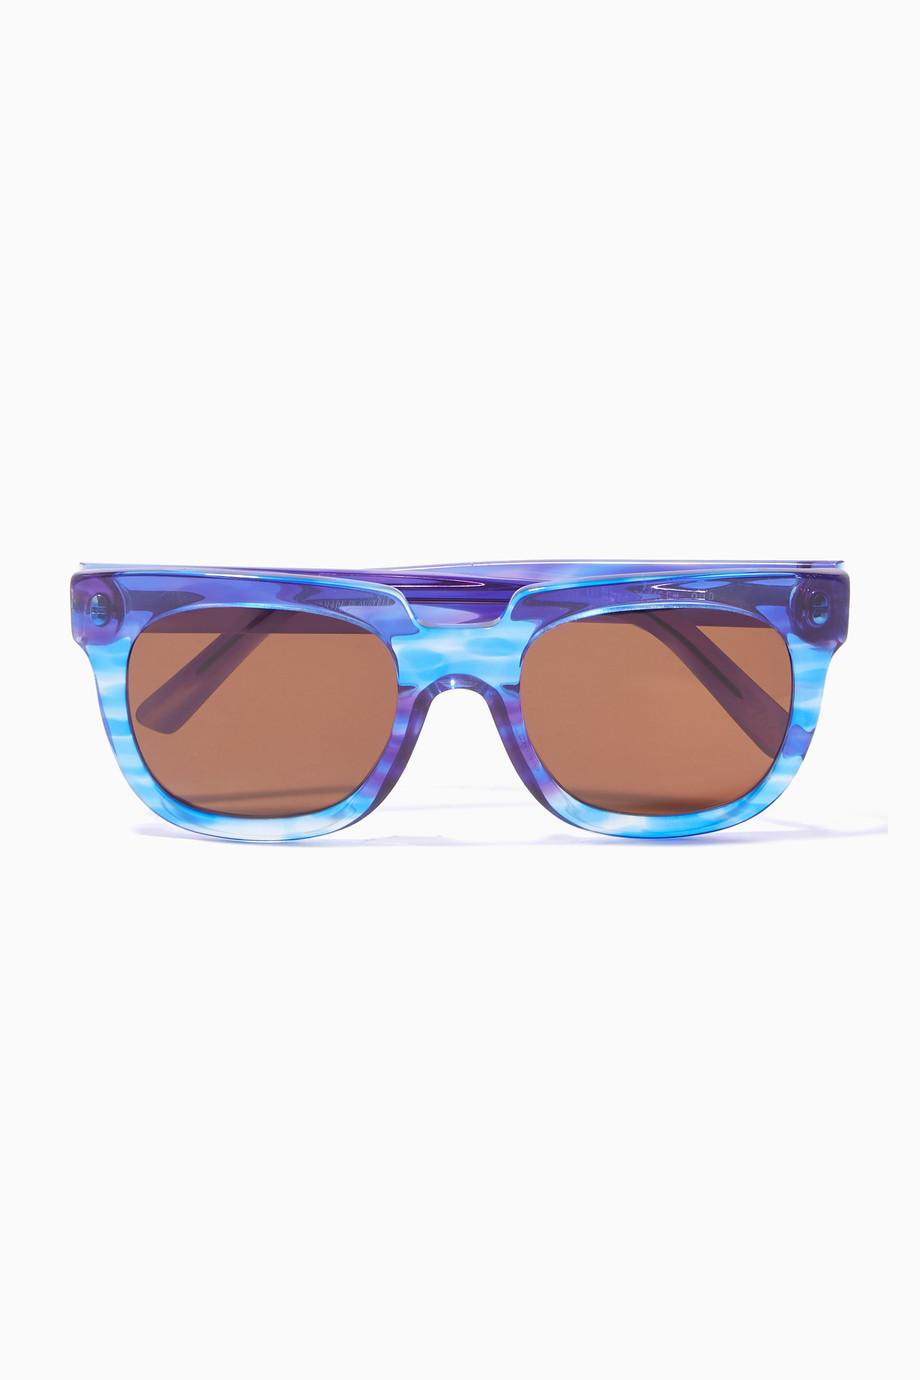 3d3af2679 تسوق نظارات شمسية فيكتوريا إطار مربع كبيرة ازرق Andy Wolf أزرق ...